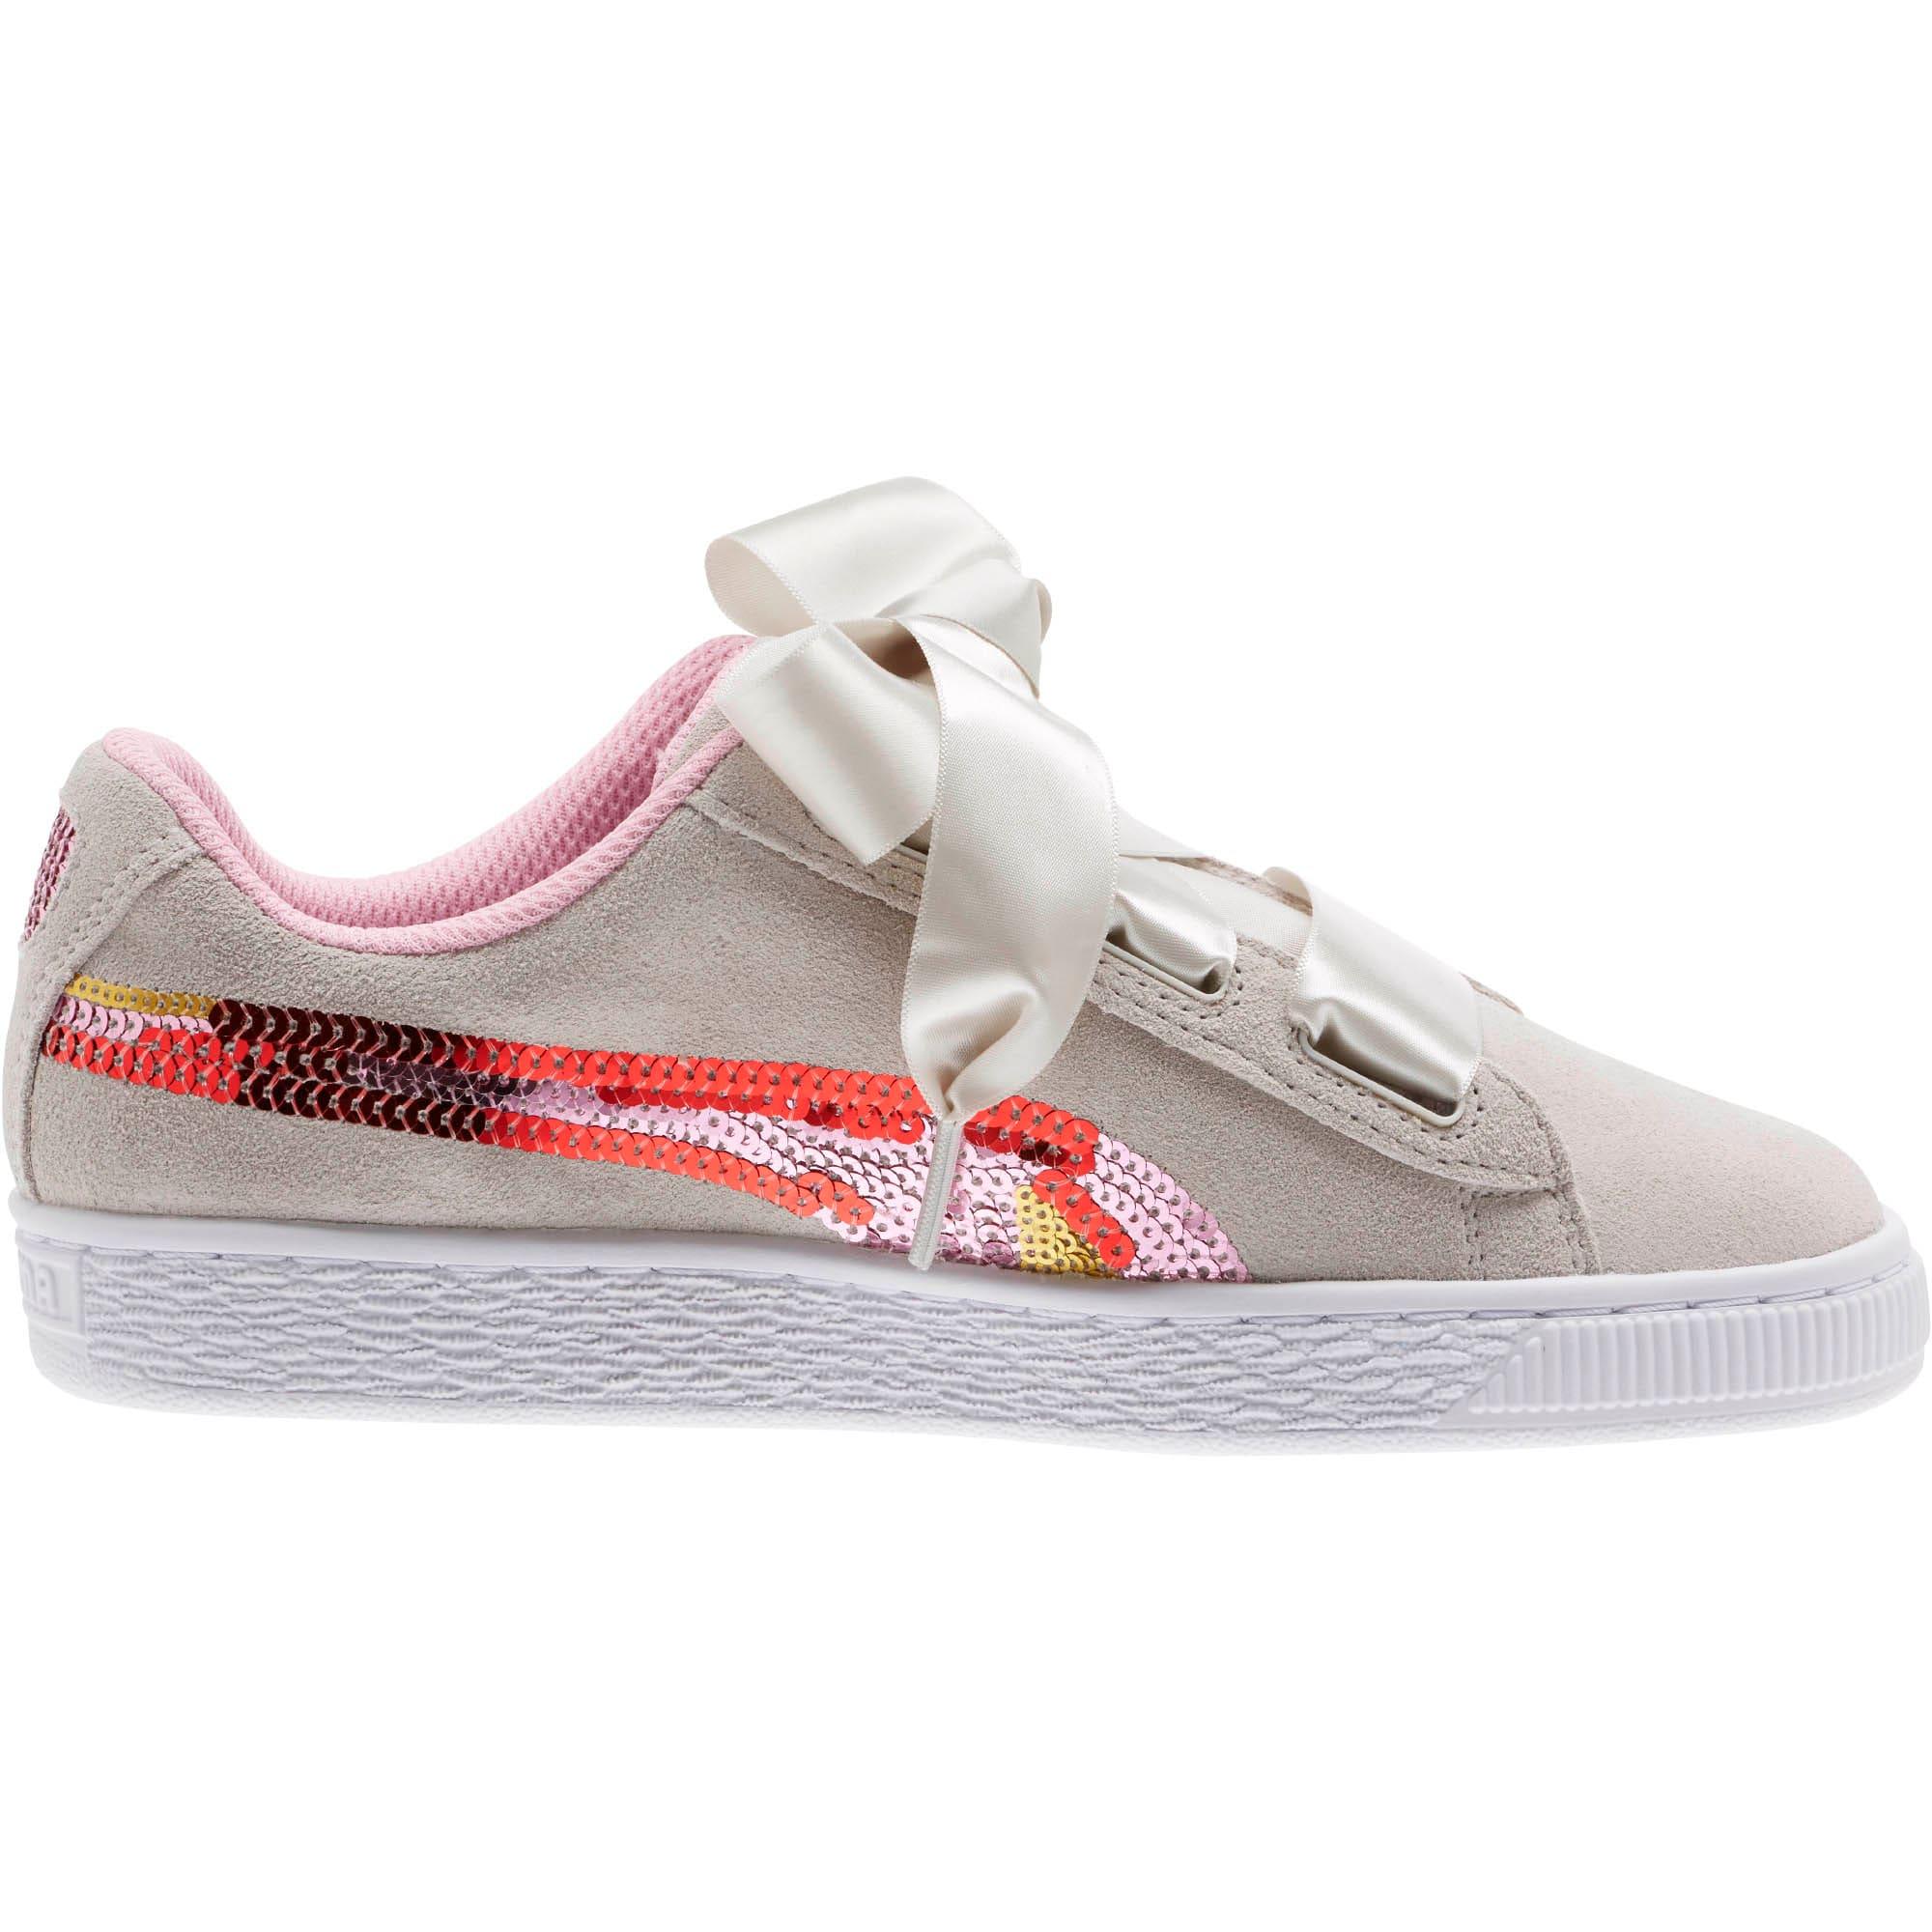 Thumbnail 3 of Suede Heart Trailblazer Sequin Sneakers JR, Gray Violet-Pale Pink, medium